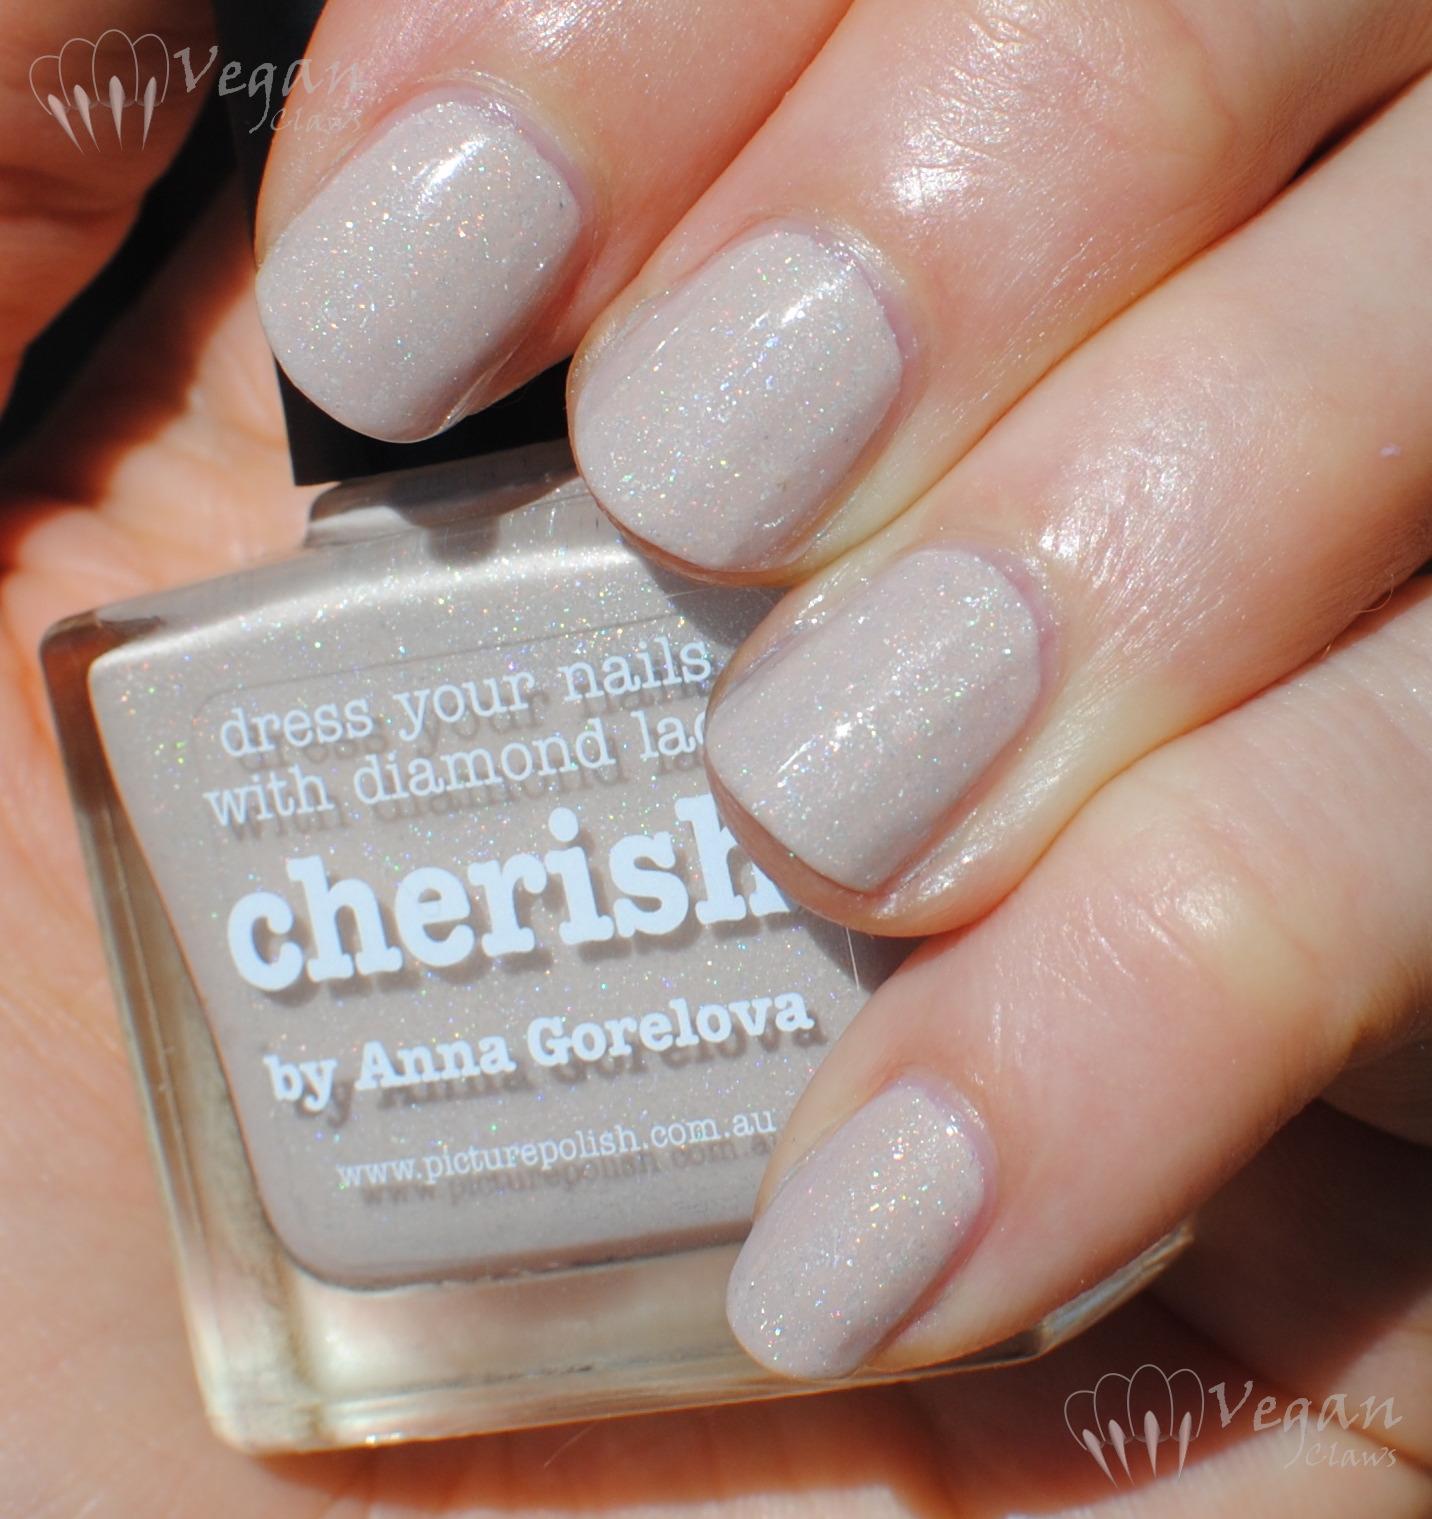 Picture Polish Cherish and chevron nail art | Vegan Claws